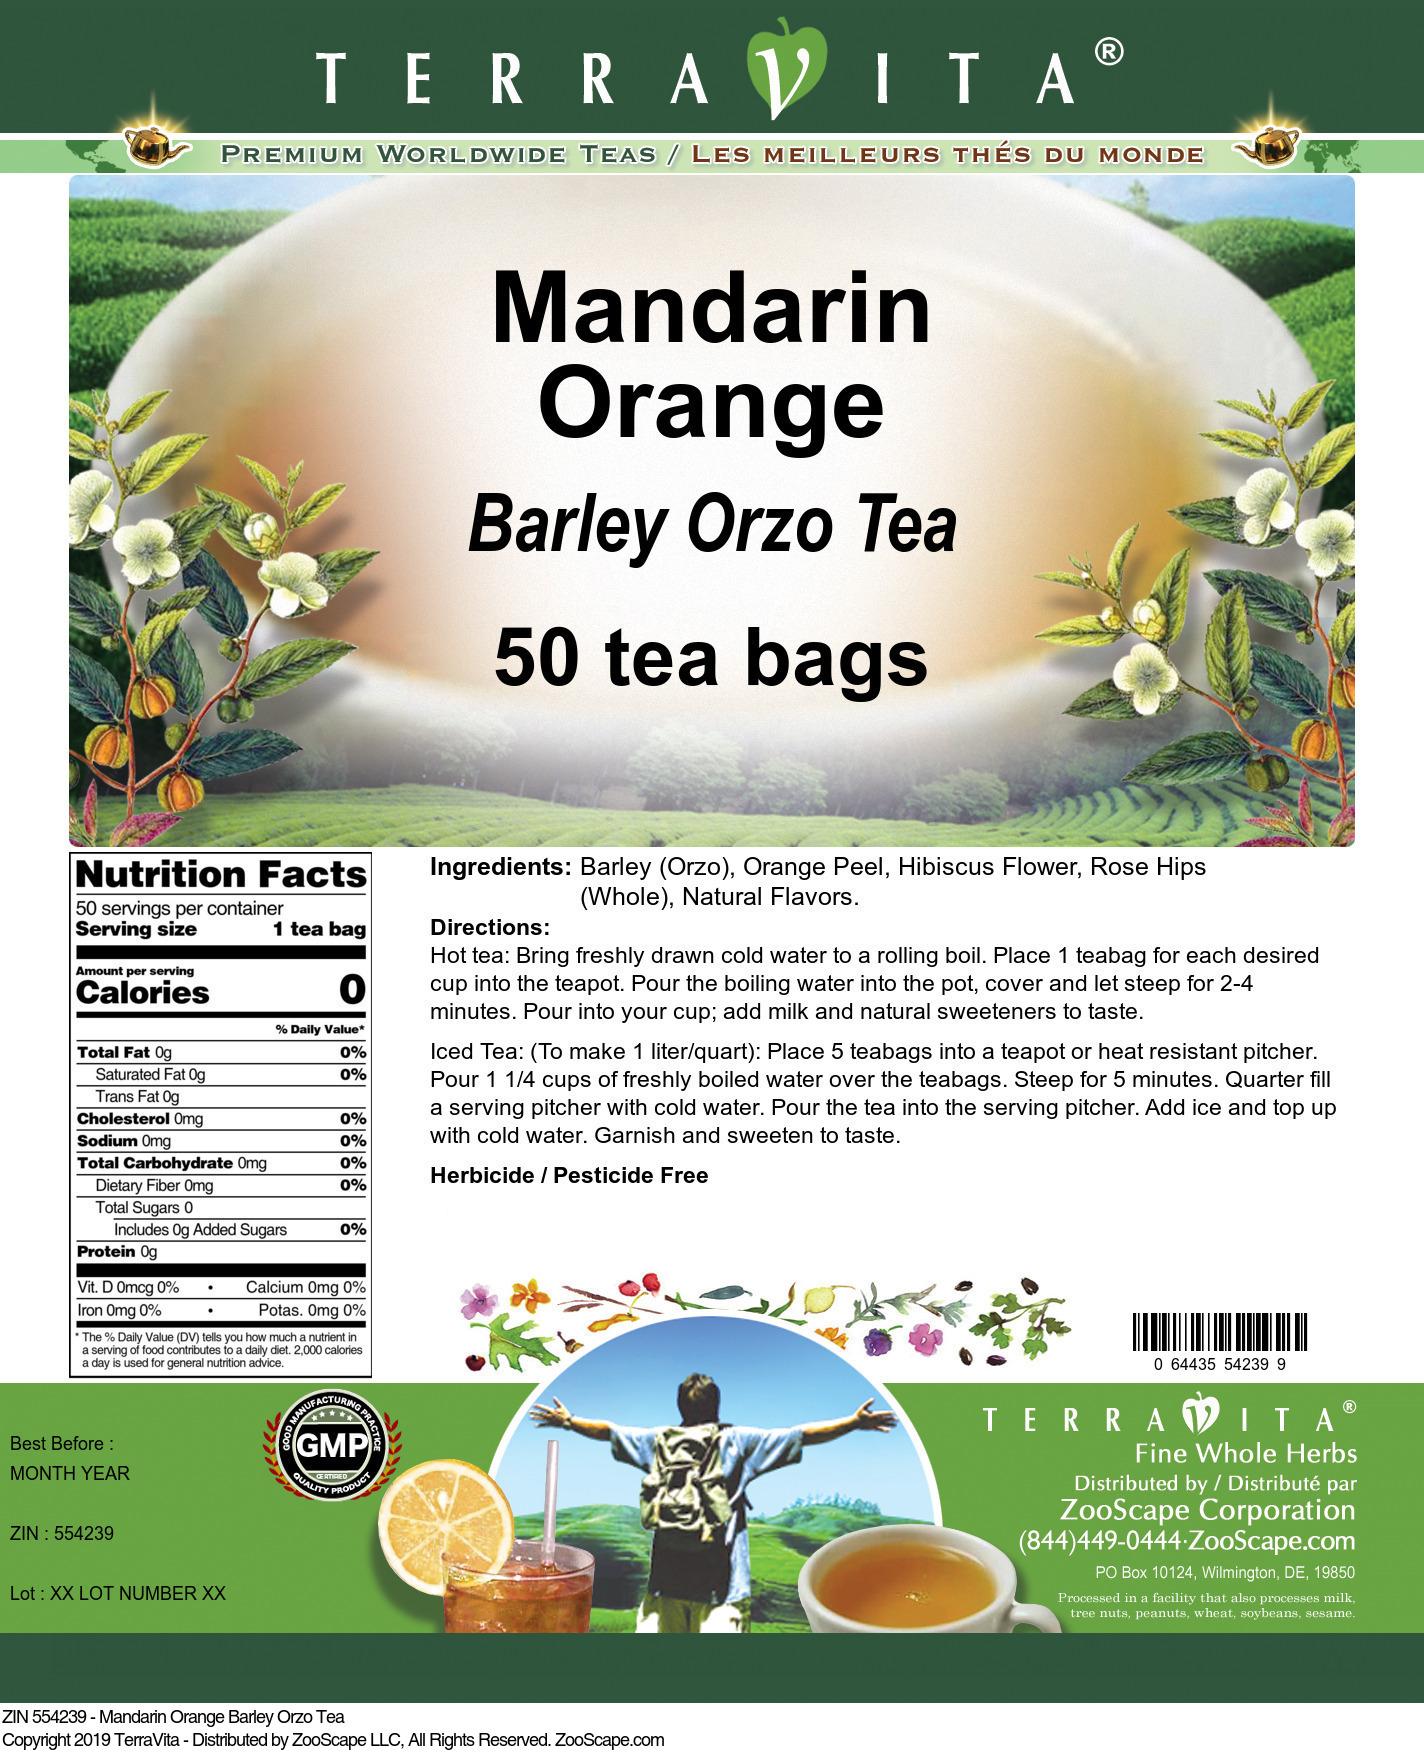 Mandarin Orange Barley Orzo Tea